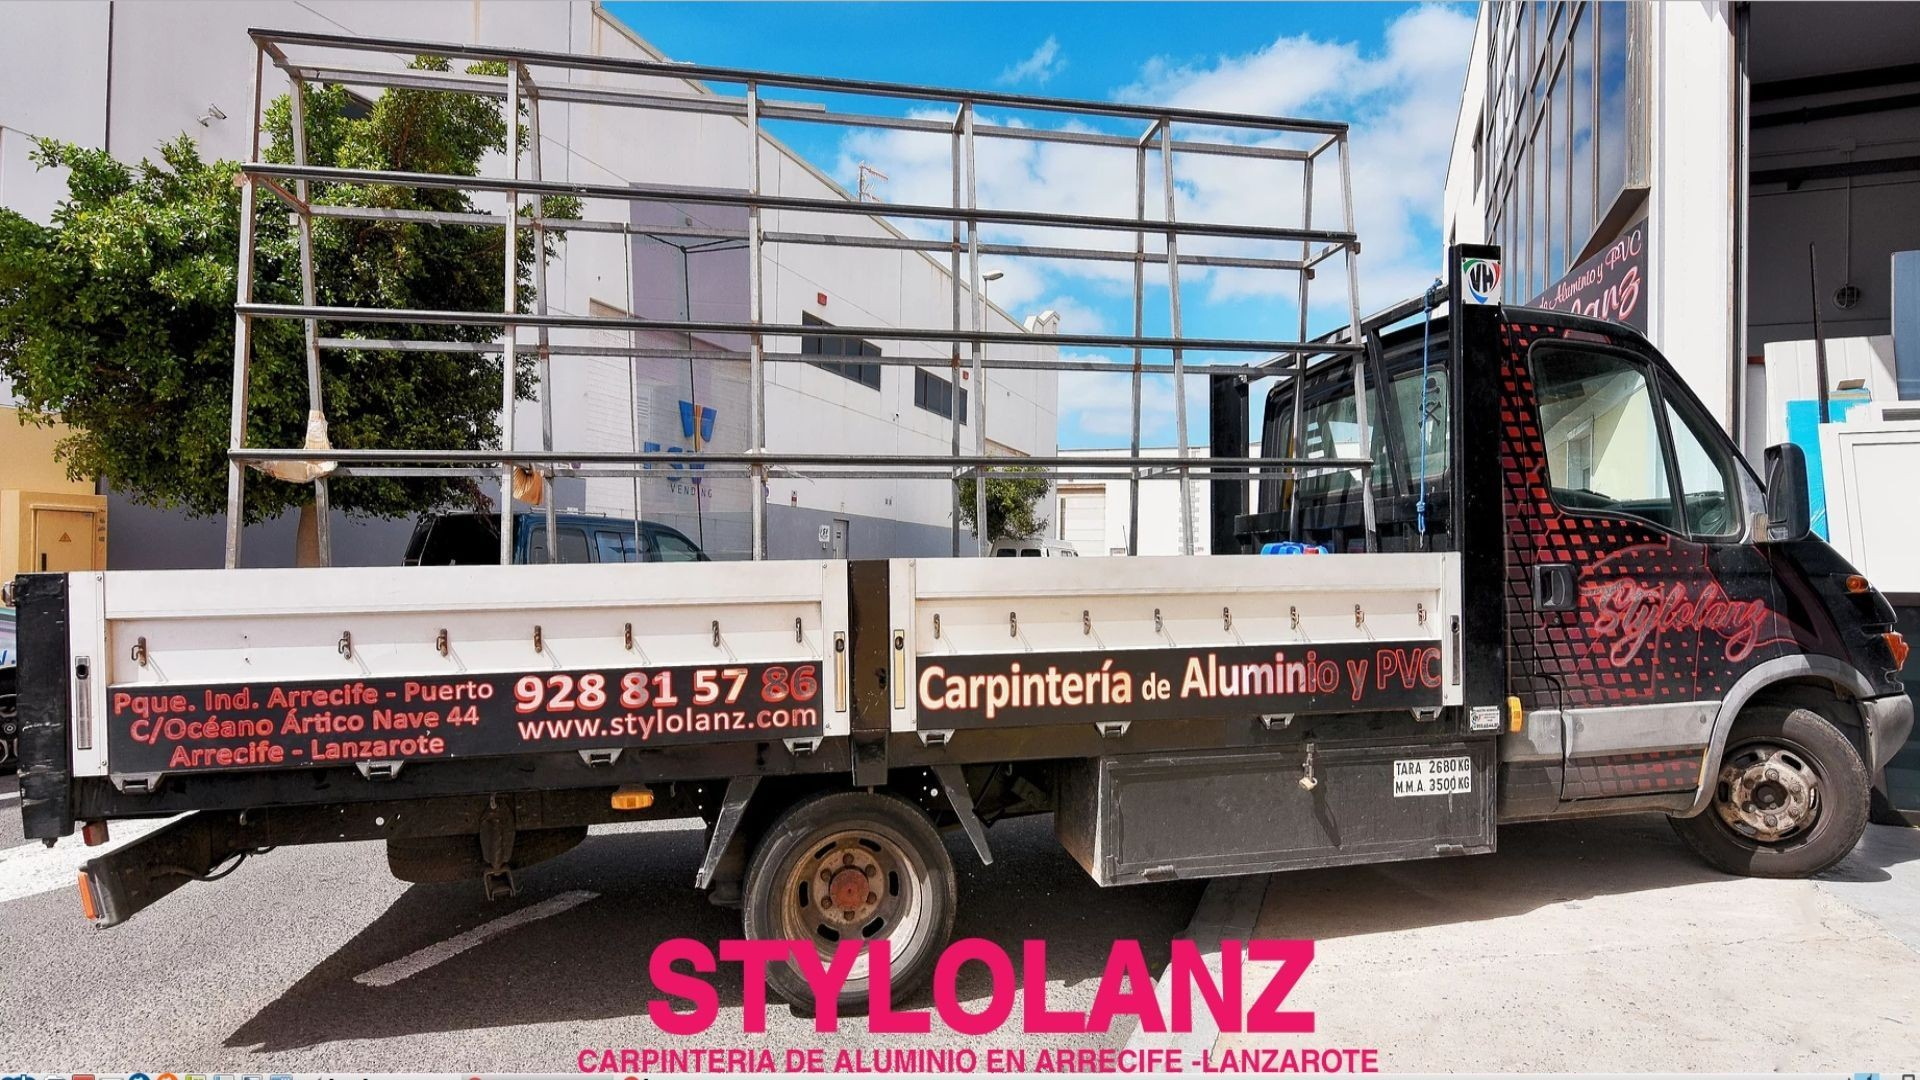 Carpintería de Aluminio Lanzarote